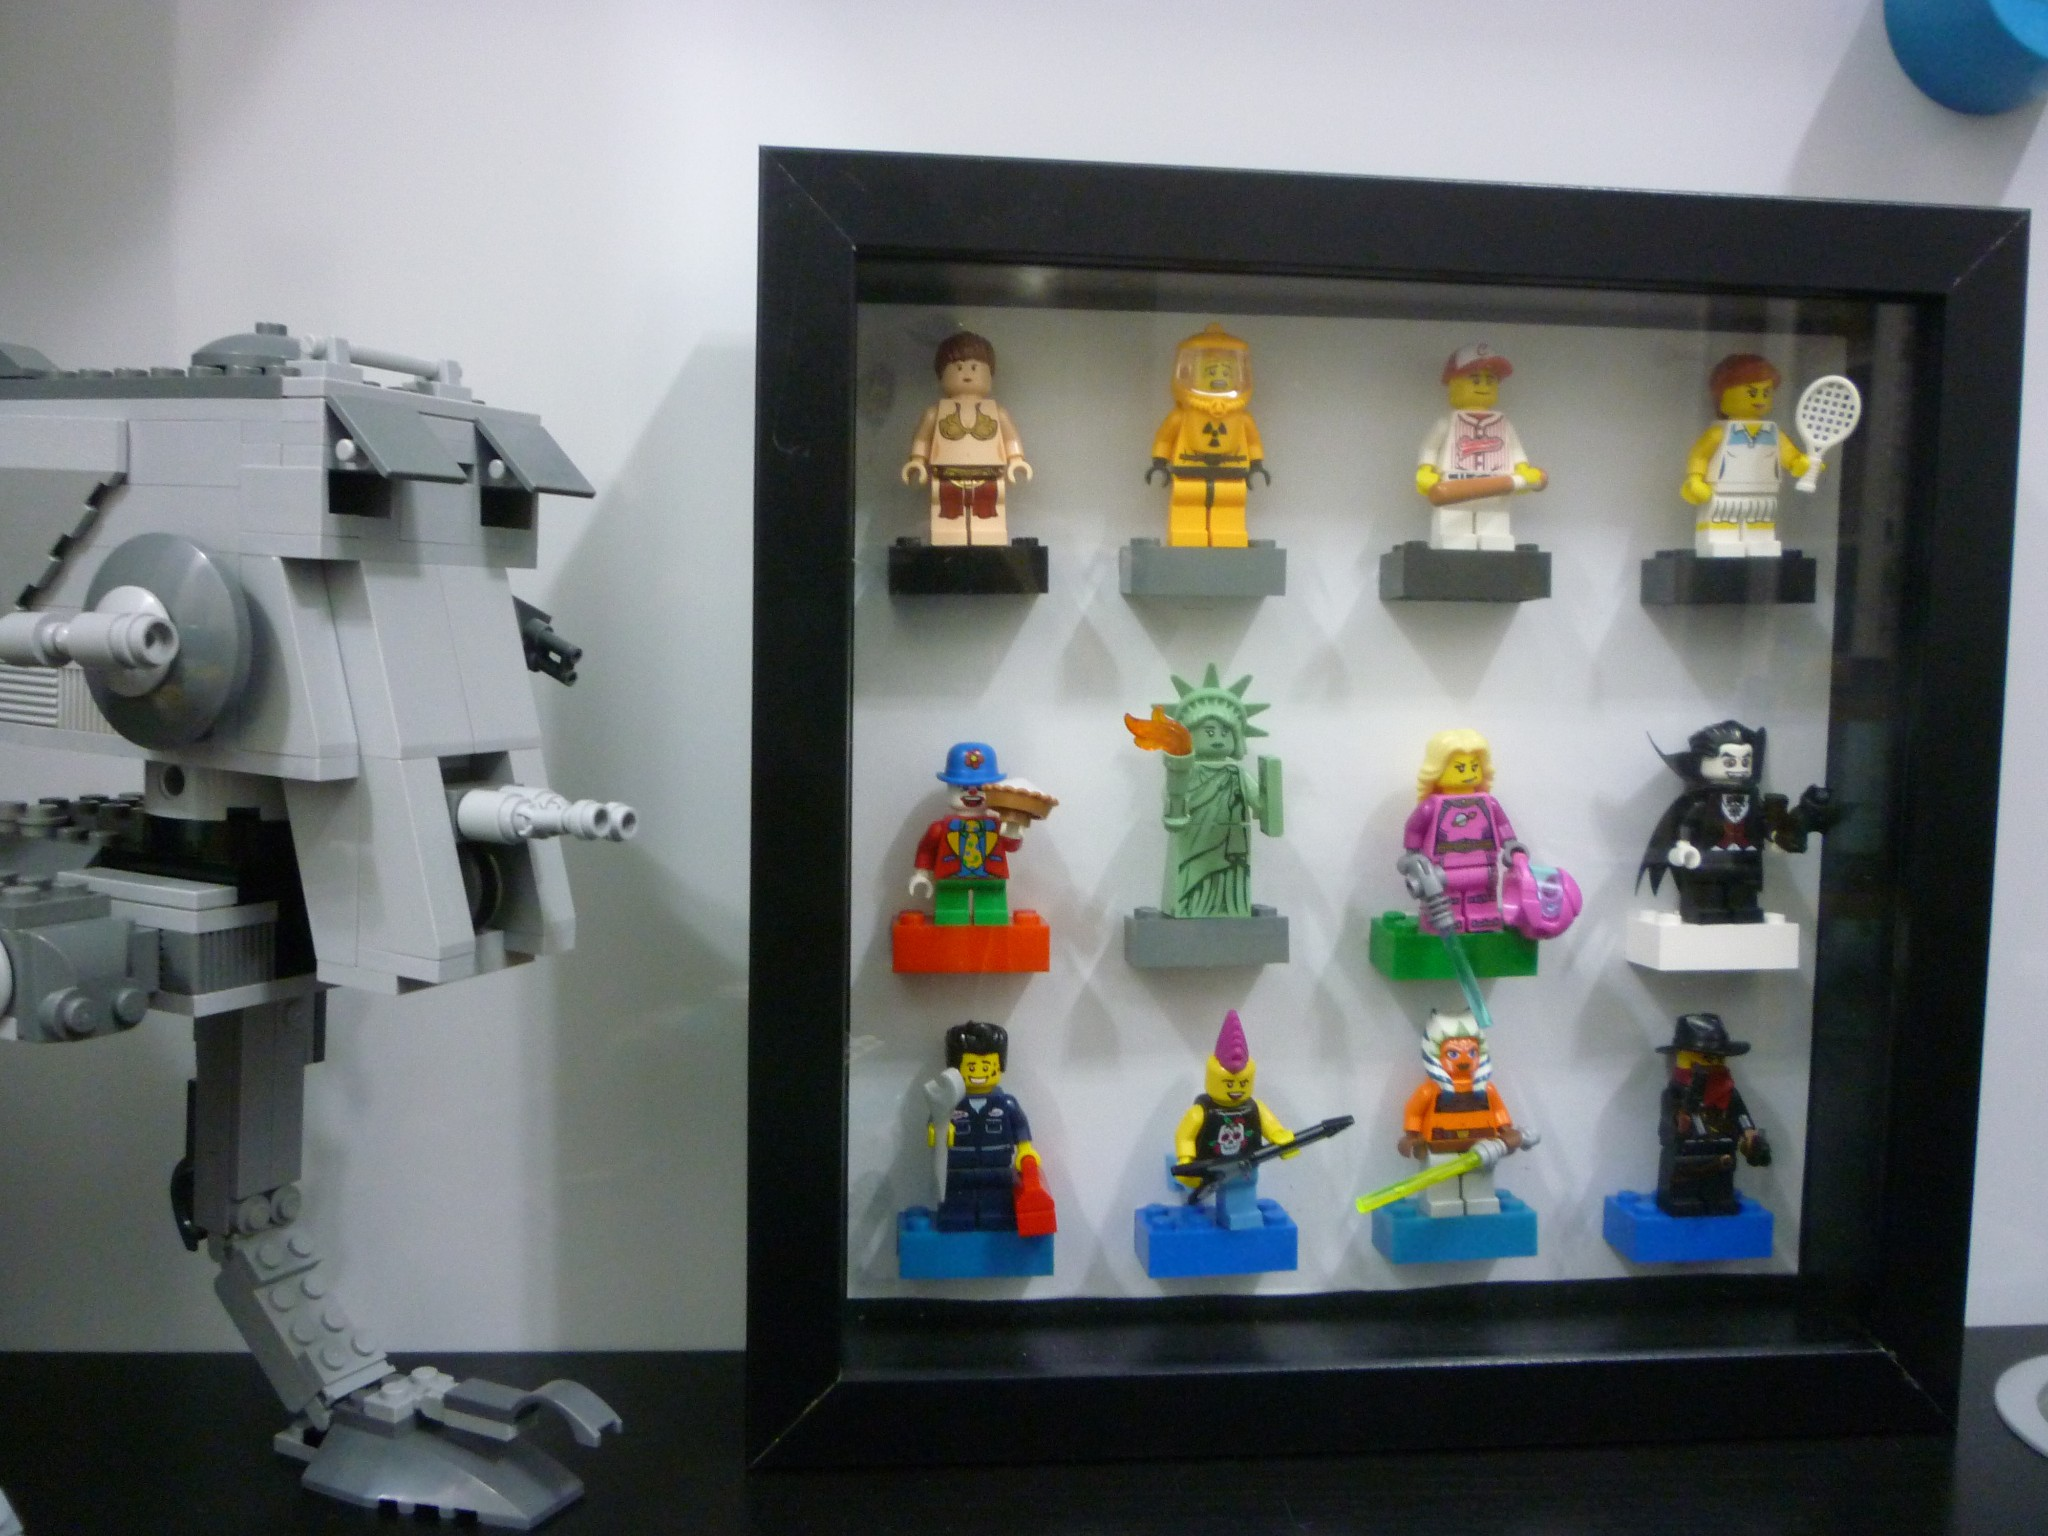 DIY: Make your own Lego Minifigure Display